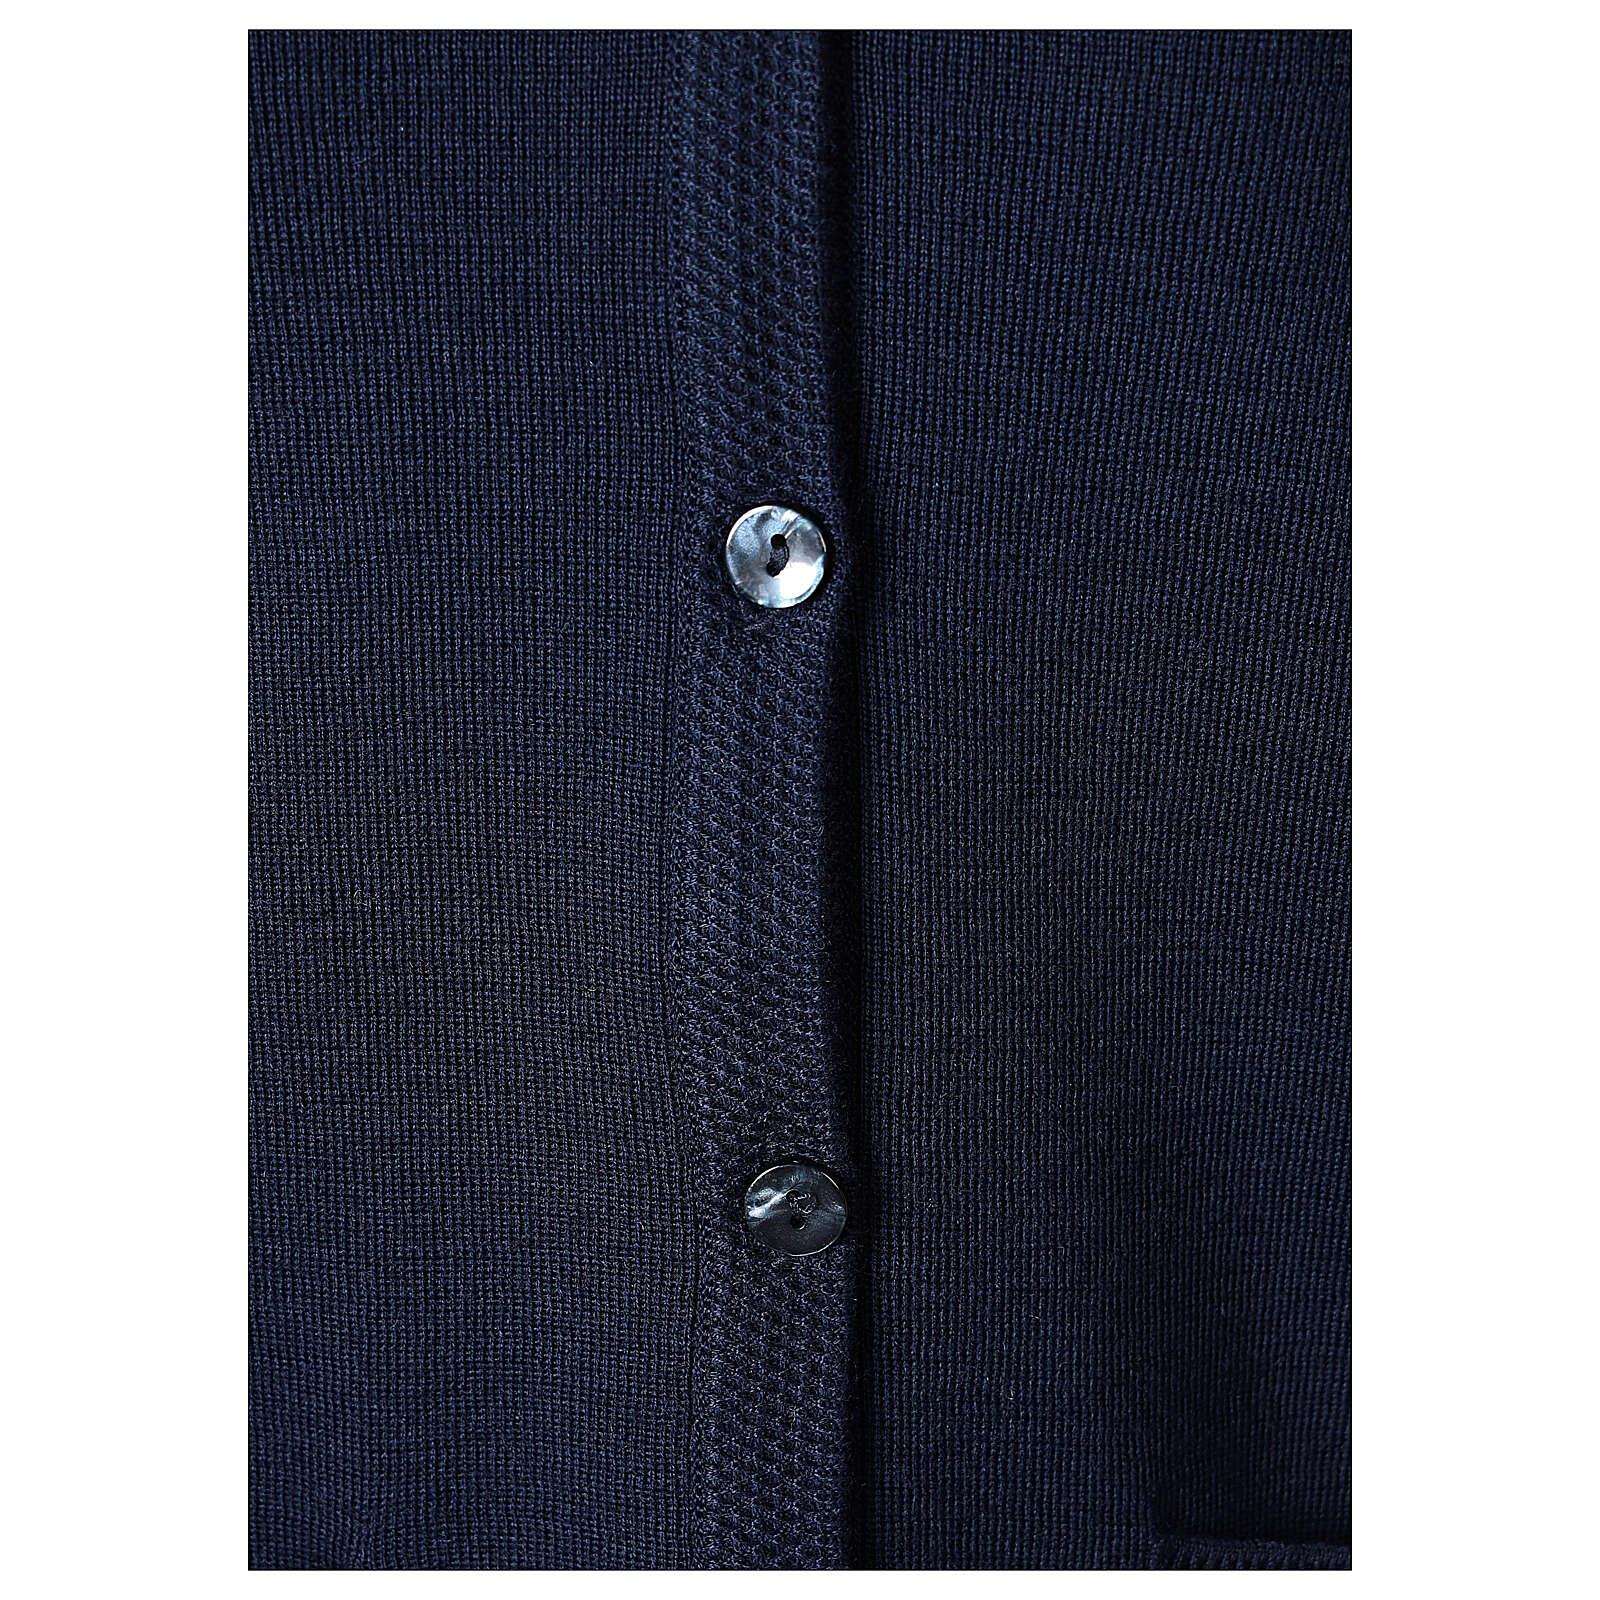 Rebeca azul monja cuello V bolsillos punto unido 50% acrílico 50% lana merina In Primis 4